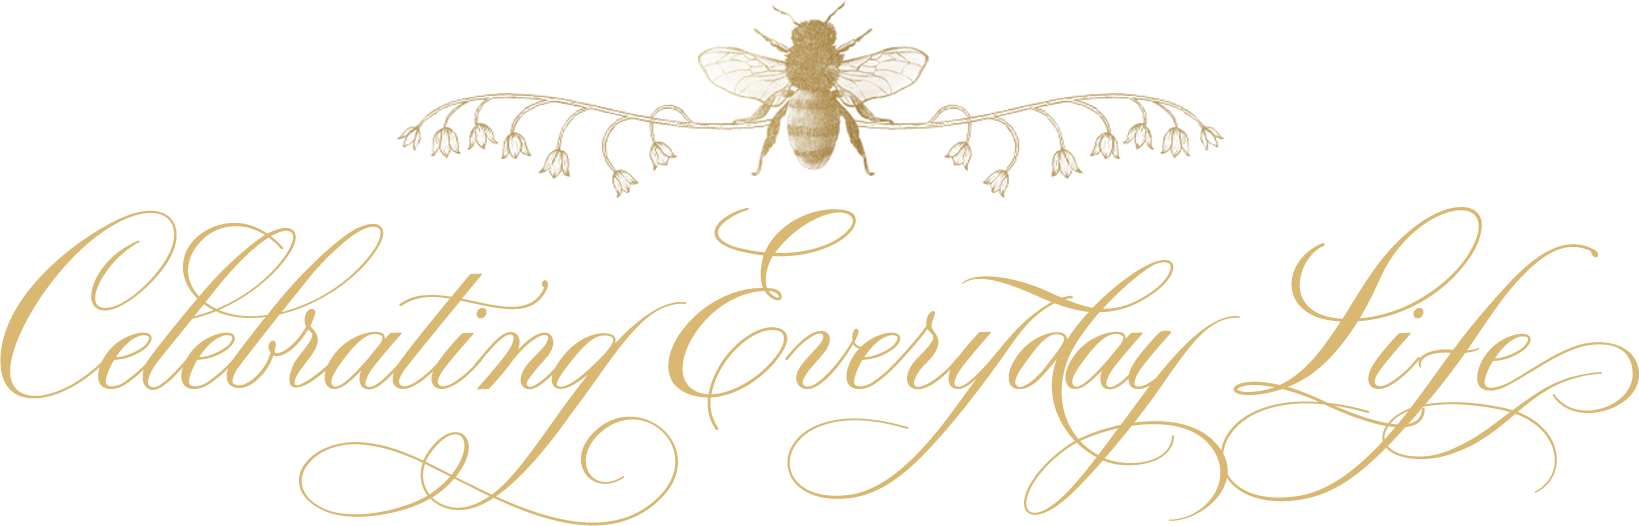 Celebrating Everyday Life with Jennifer Carroll